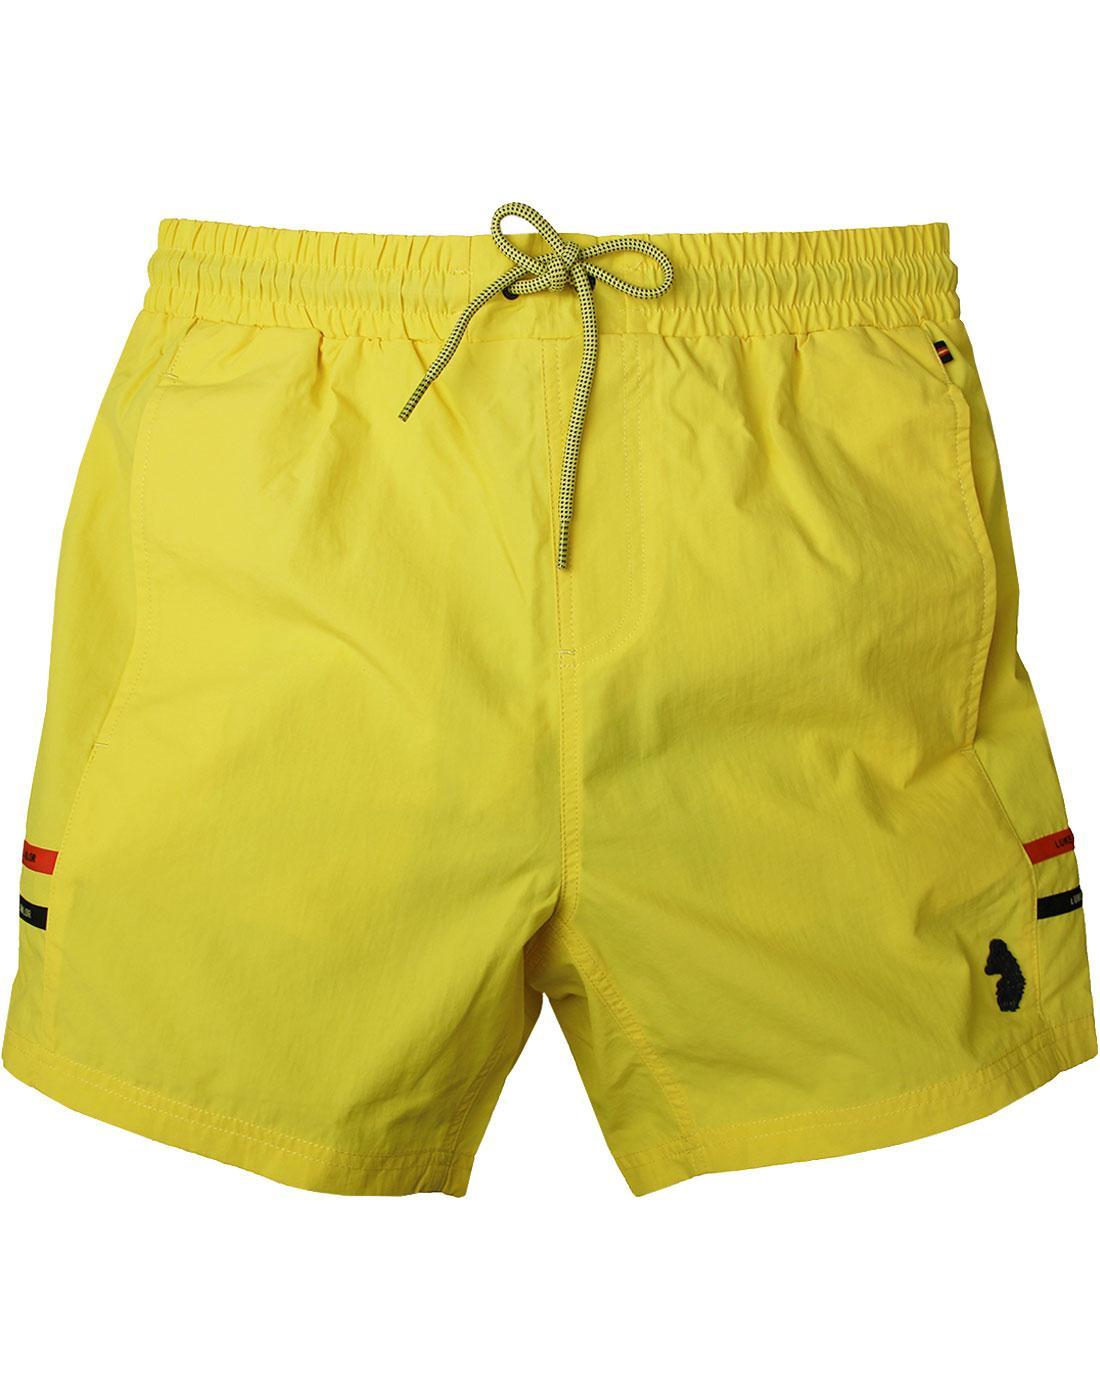 Ragy LUKE 1977 SPORT Men's Retro Swim Shorts Lemon